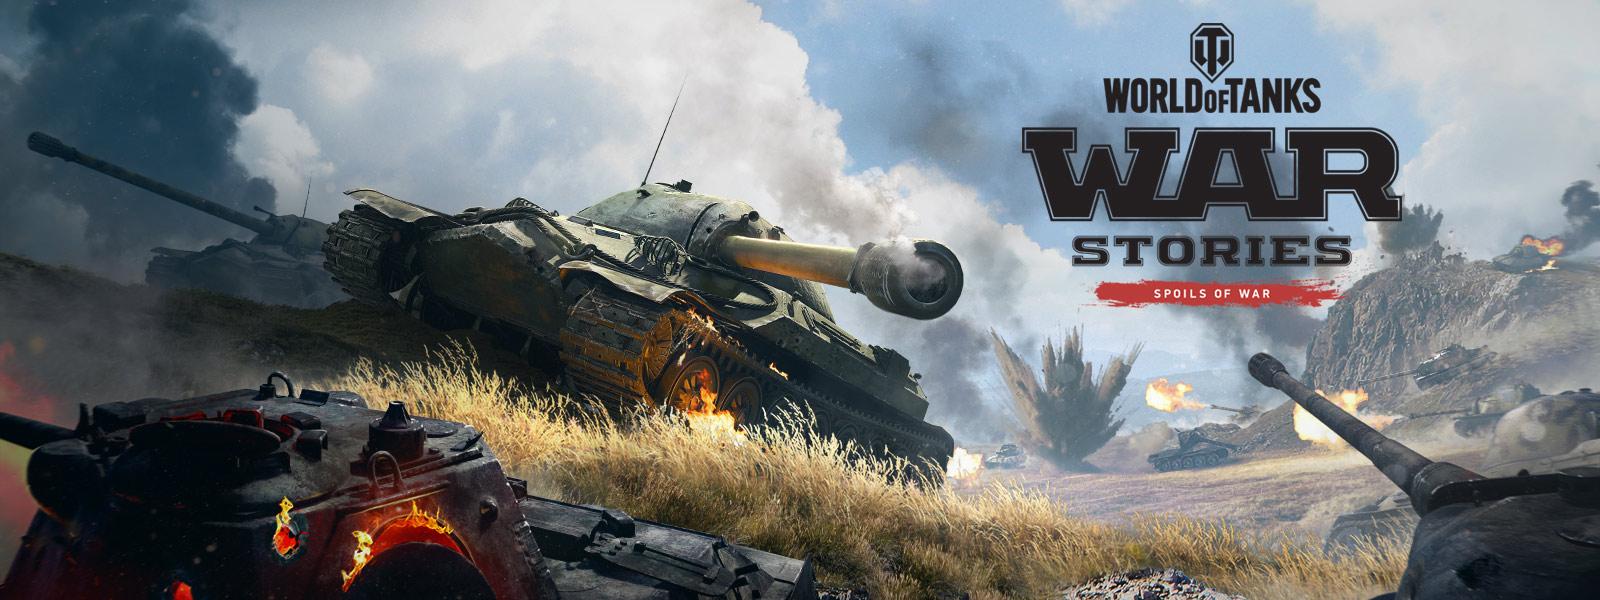 World of Tanks War Stories Spoils